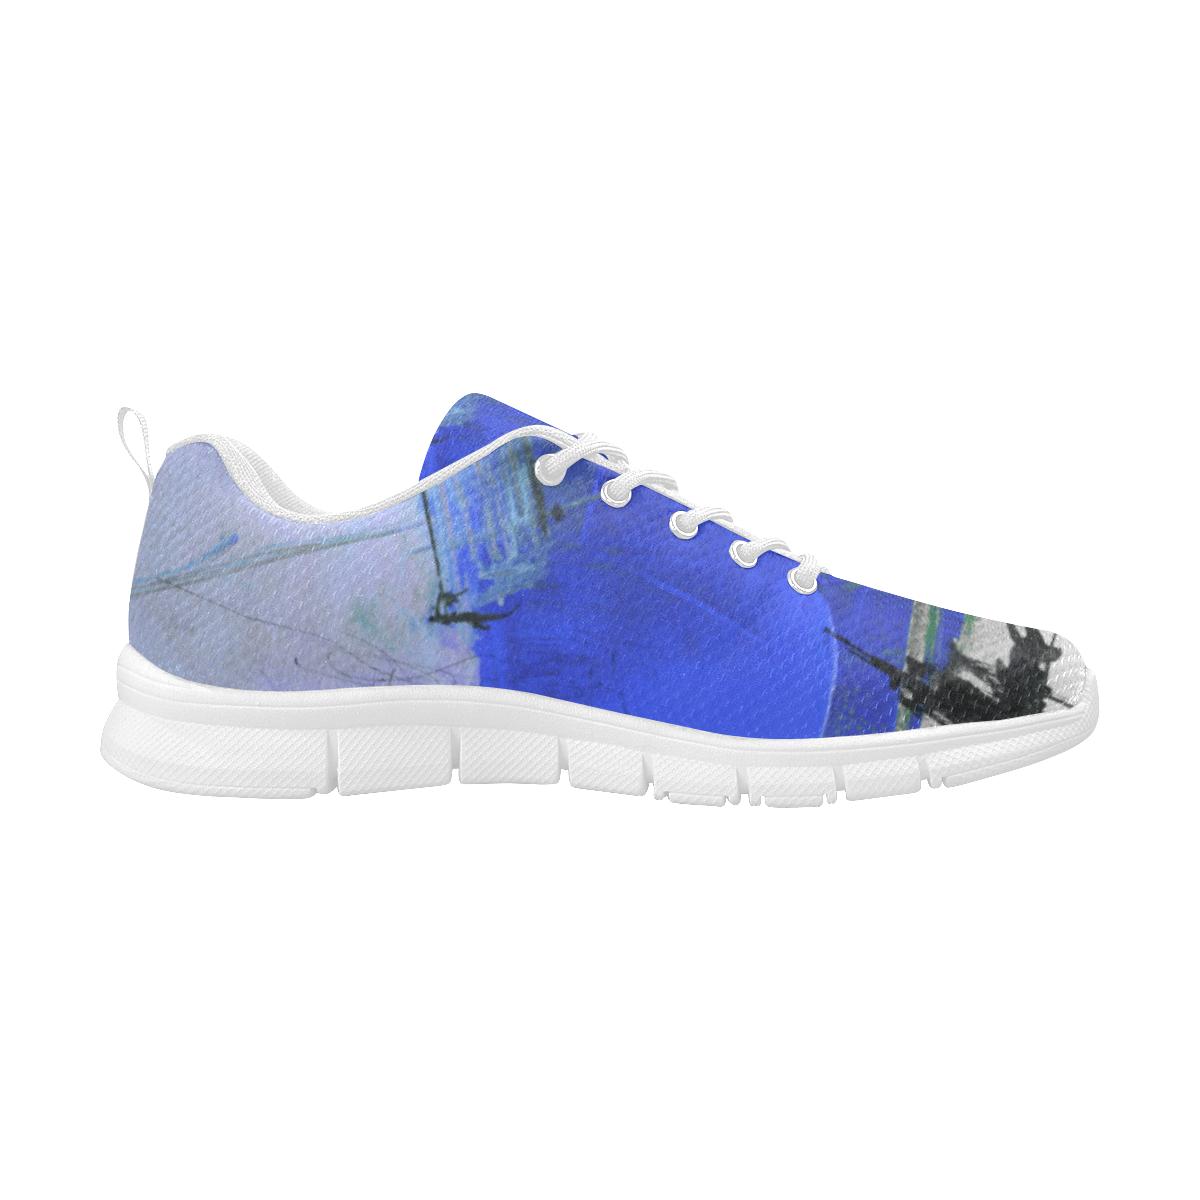 Lua Blue Women's Breathable Running Shoes (Model 055)